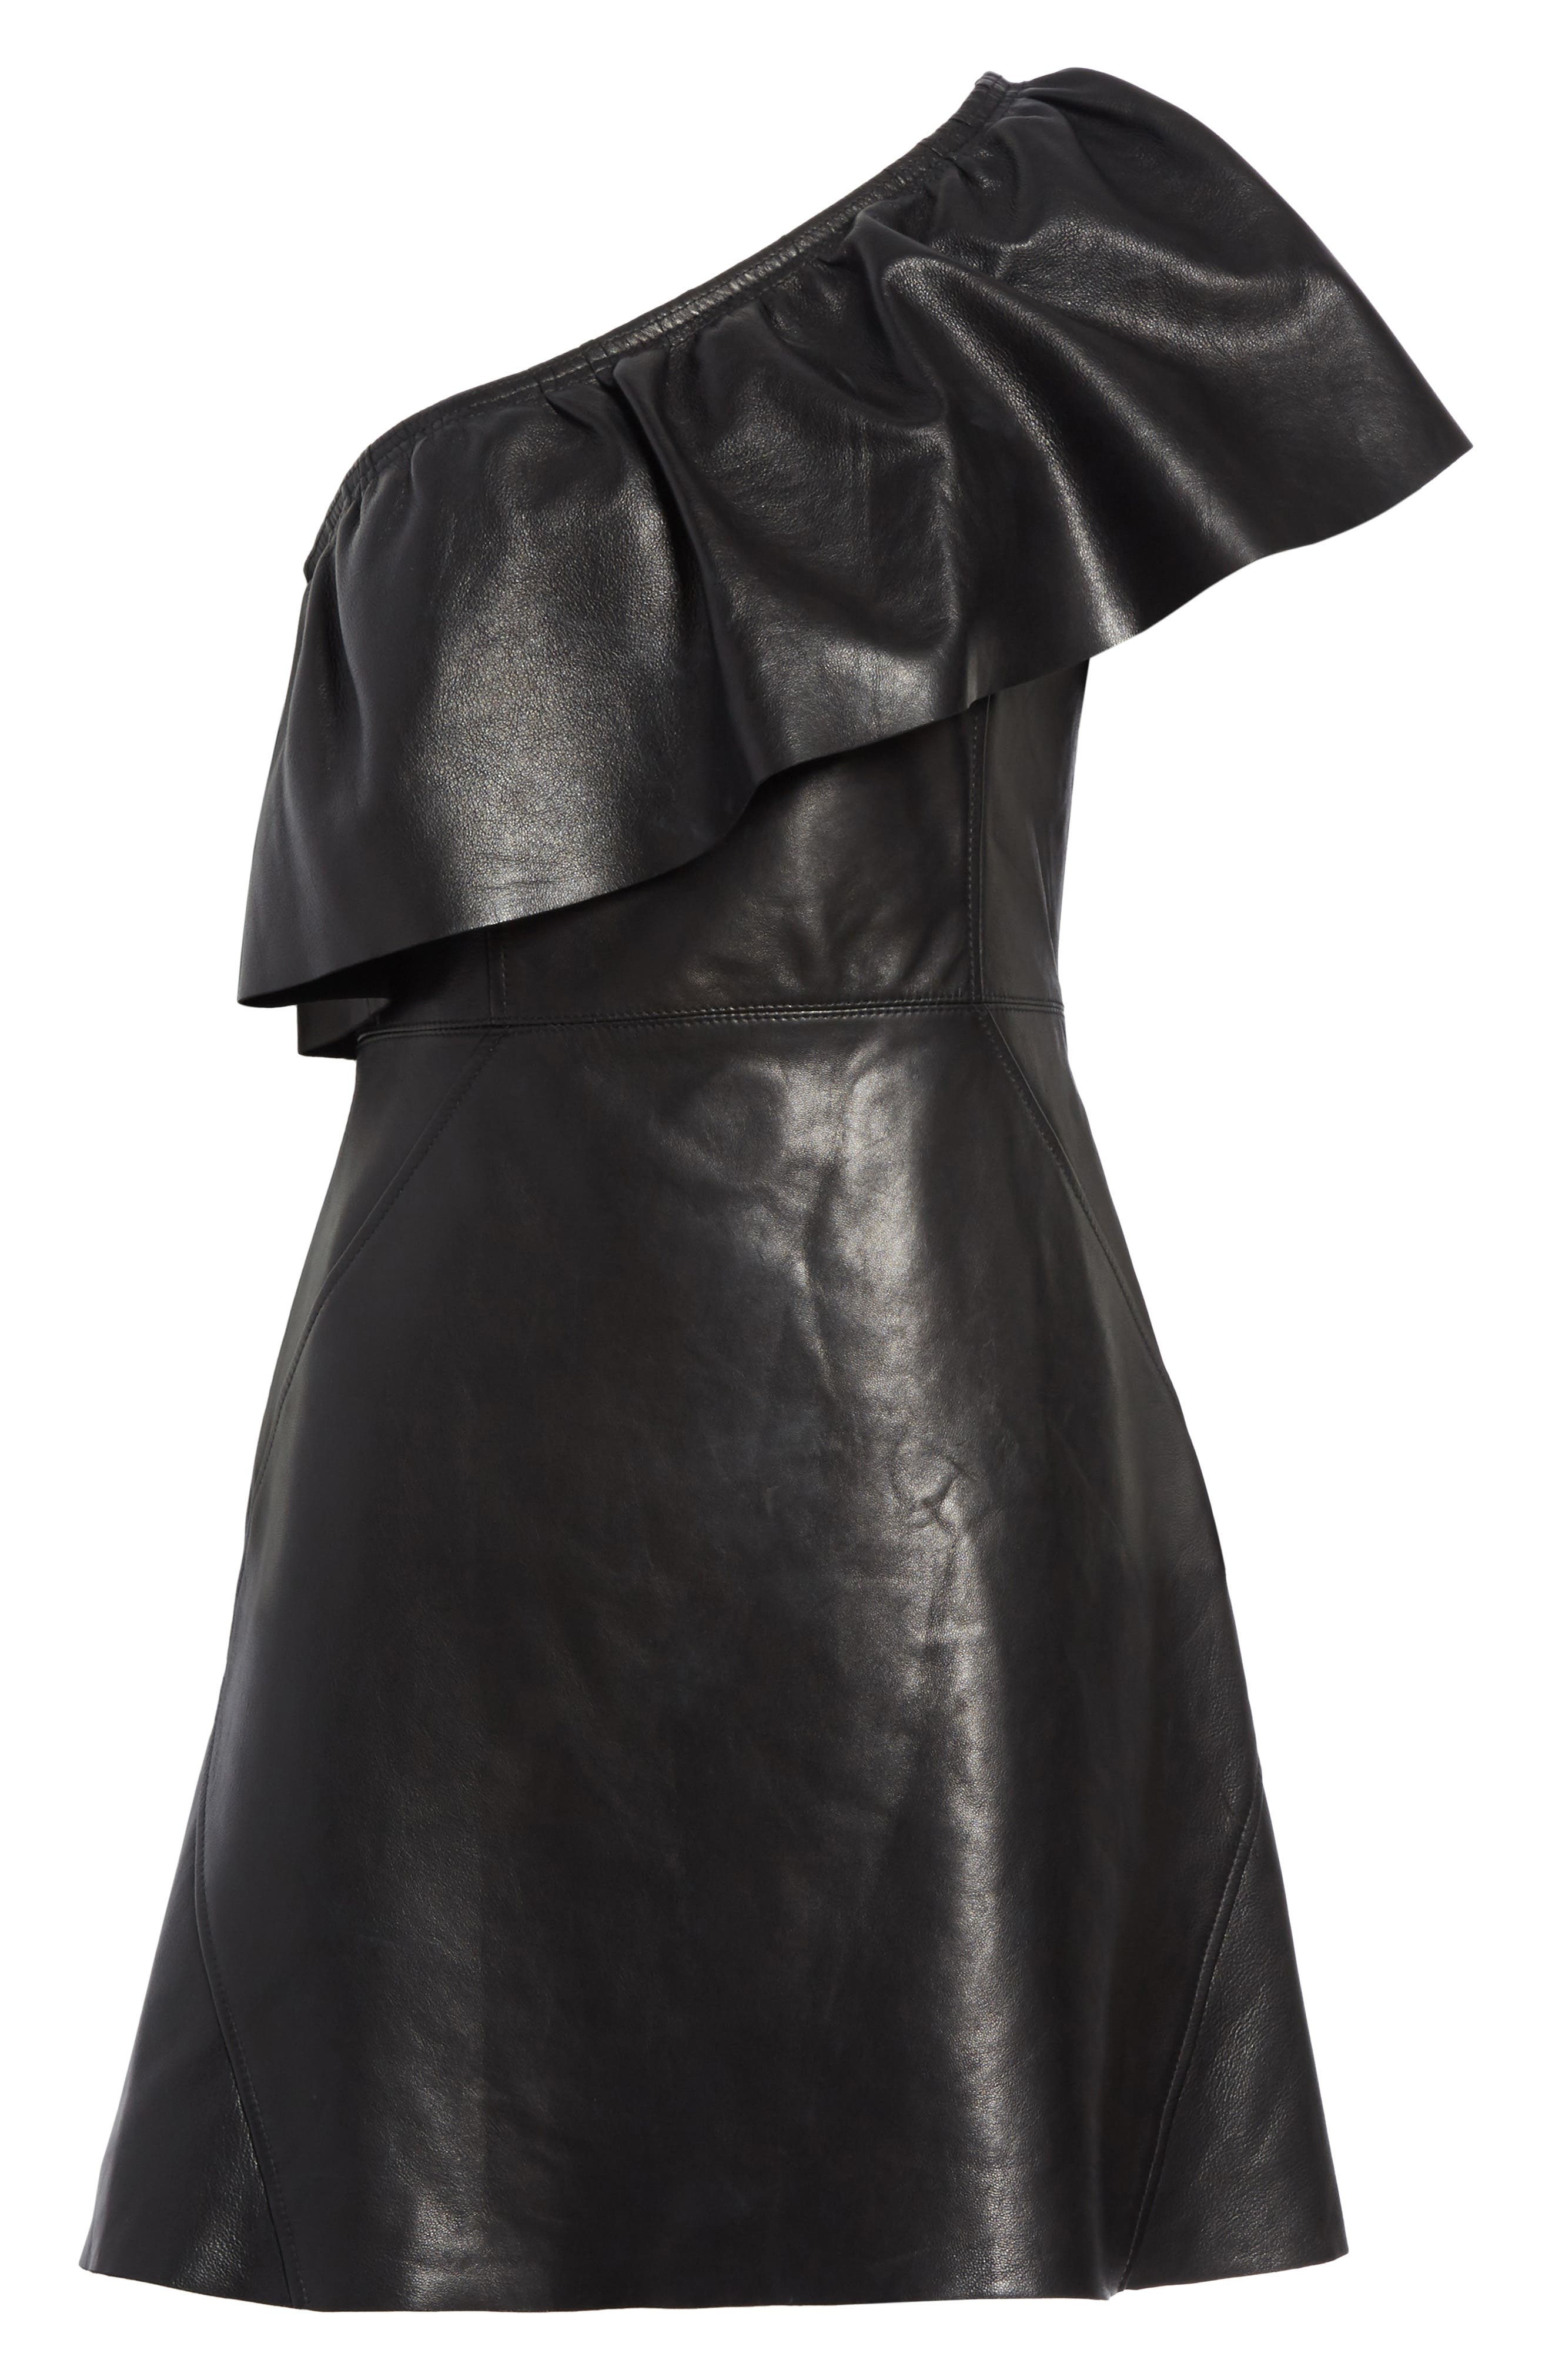 Kahlo Ruffle One-Shoulder Leather Dress,                             Alternate thumbnail 6, color,                             Black